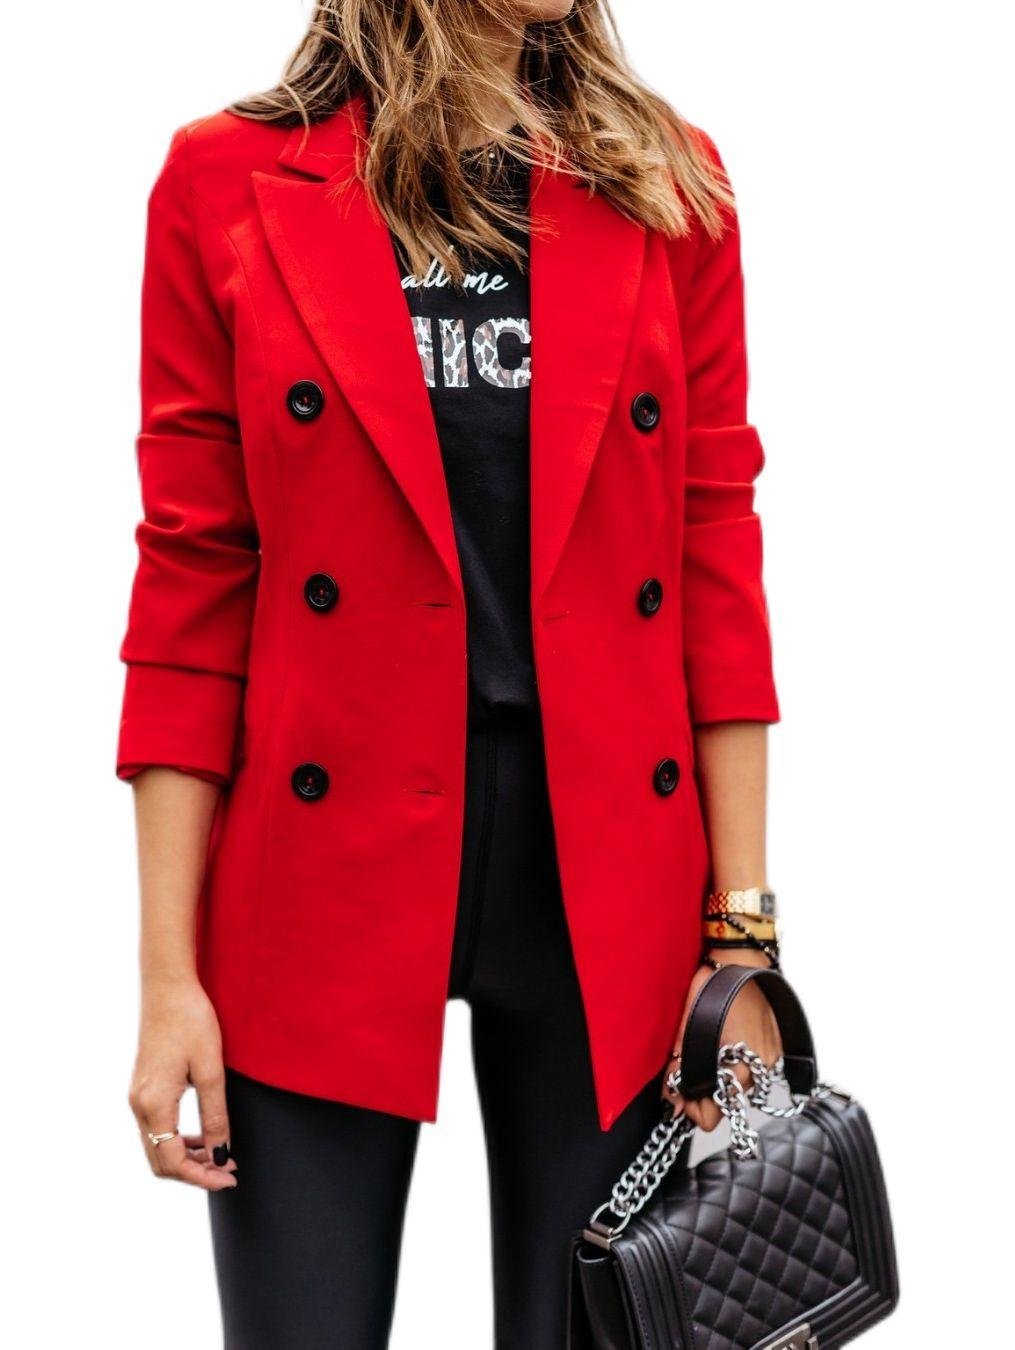 Neue Herbst Winter Frauen Blazer Mode Damen Mantel Mantel Slim Trenchcoat Blazer Winter Langarm Jacke Ol Blazers Formal